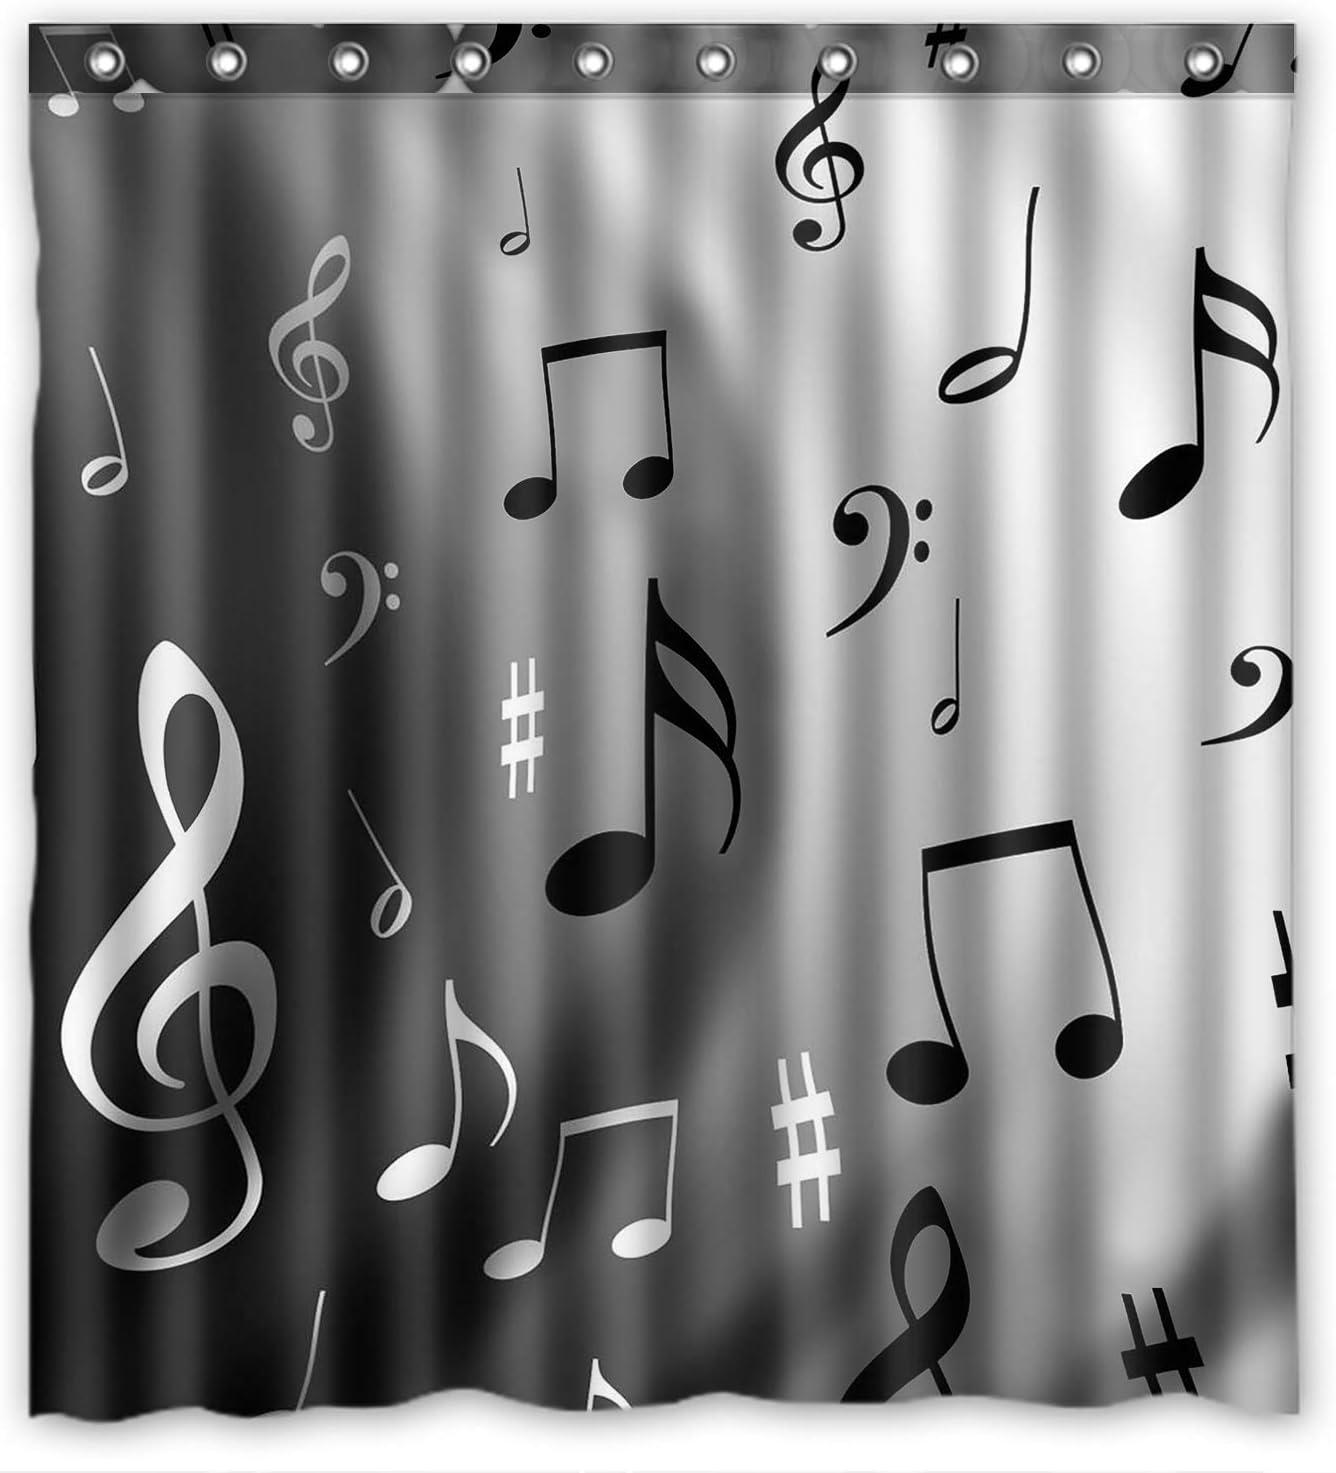 ZHANZZK Music Notes Bathroom Waterproof Shower Curtain 60x72 Inches